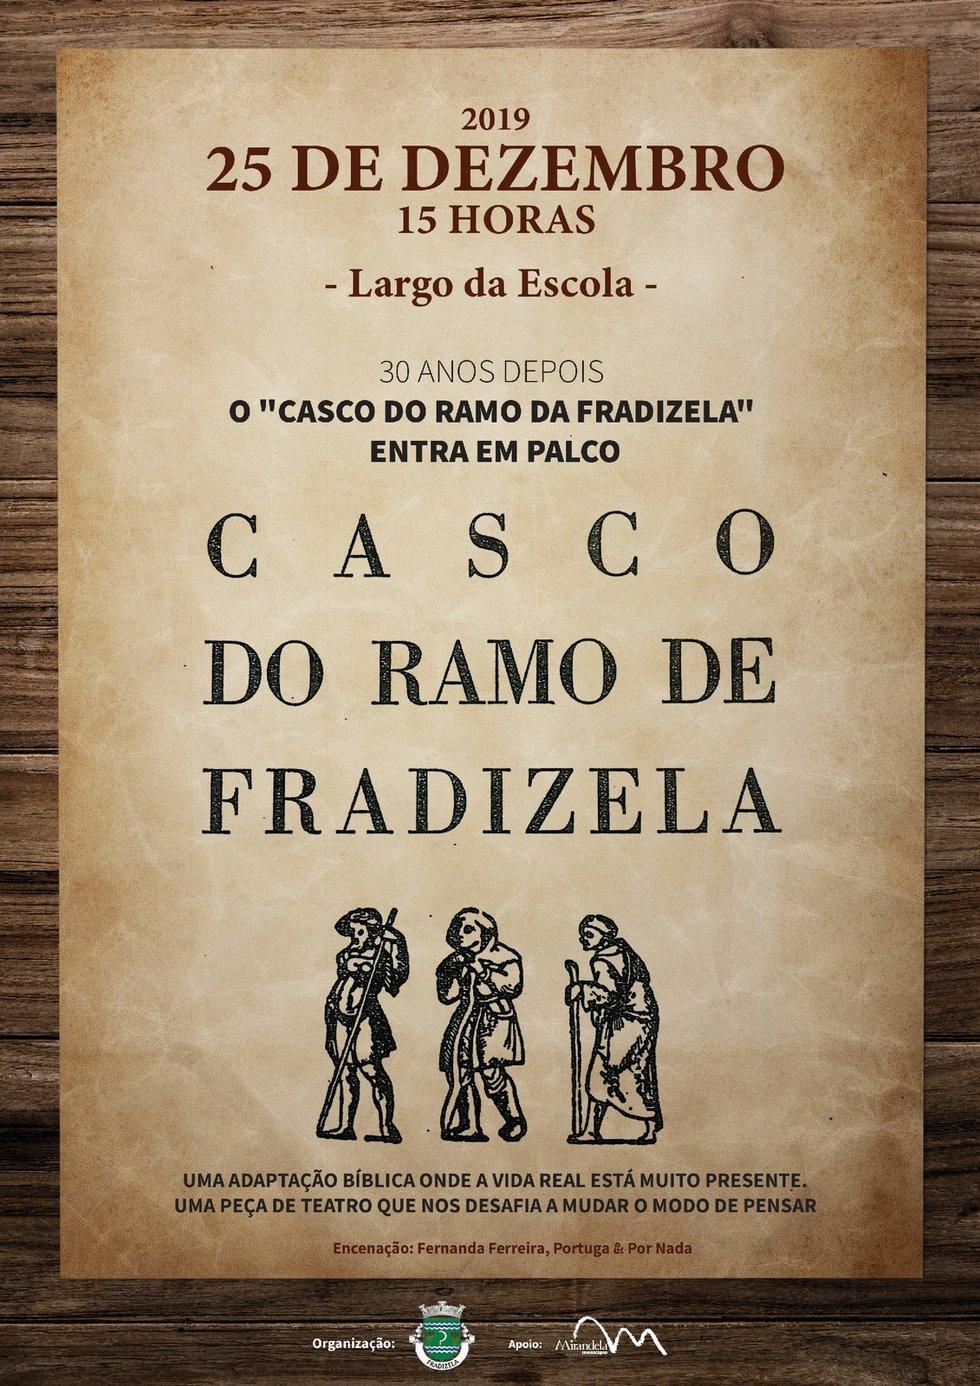 Teatro - O Casco do Ramo de Fradizela